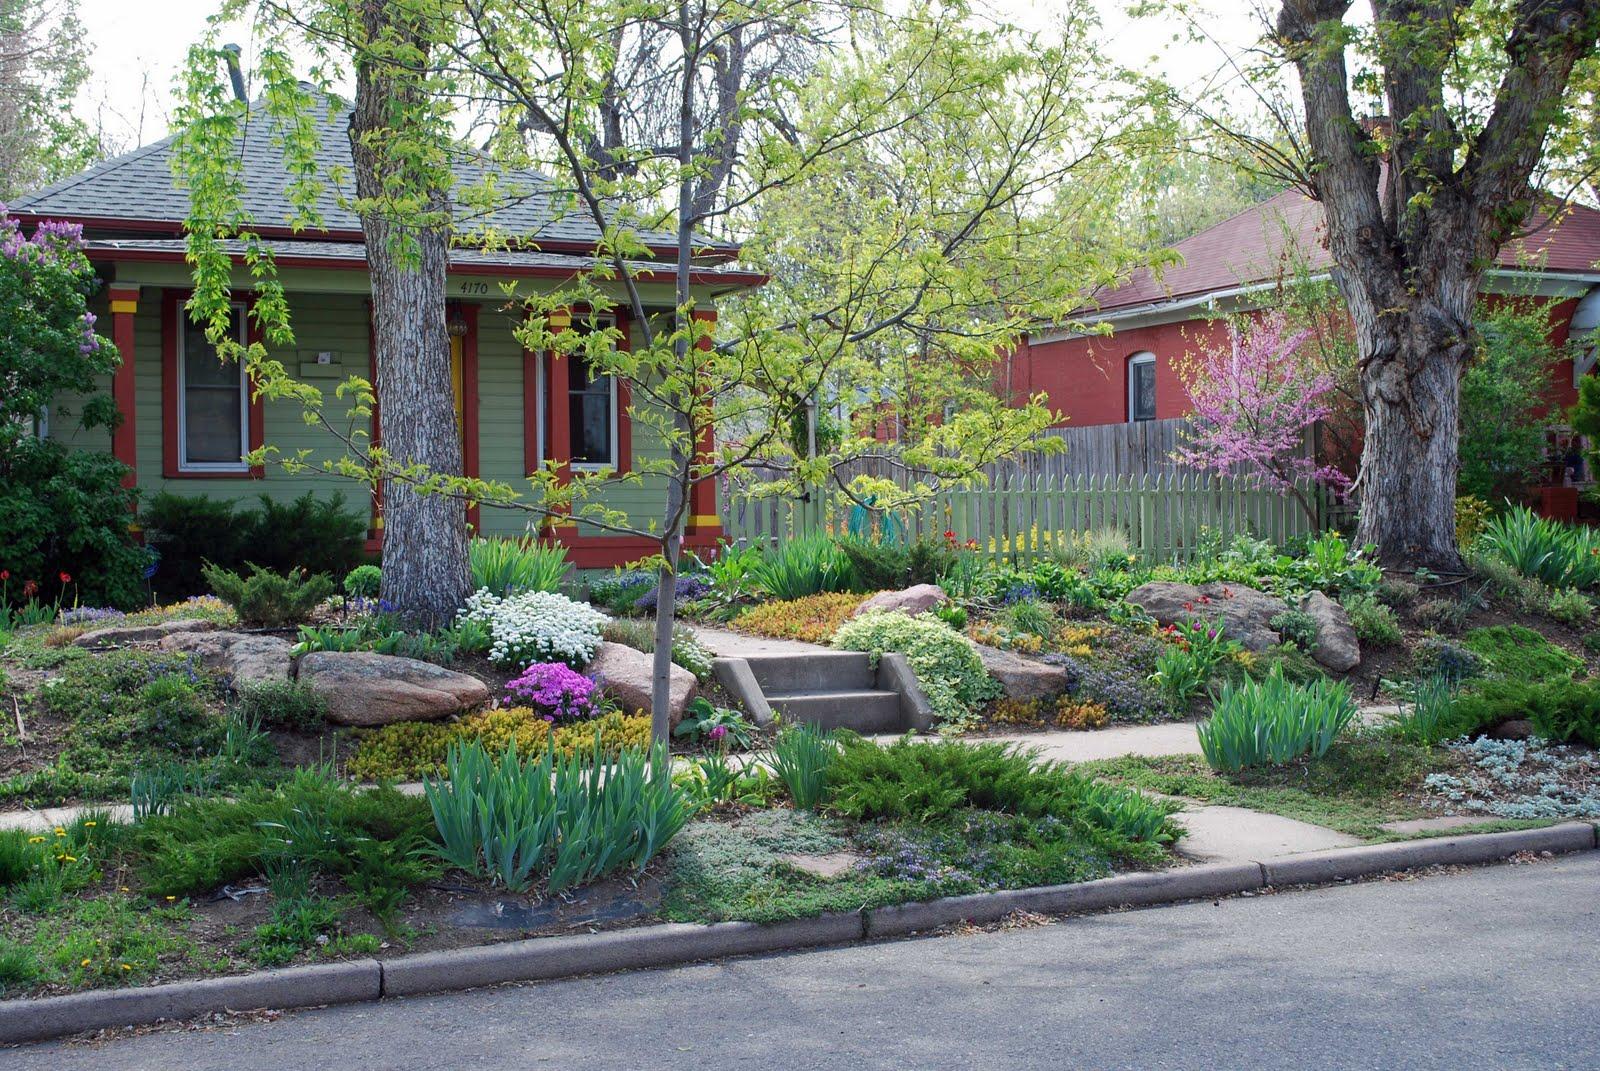 The Art Garden Garden Designers Roundtable Lawn Alternatives